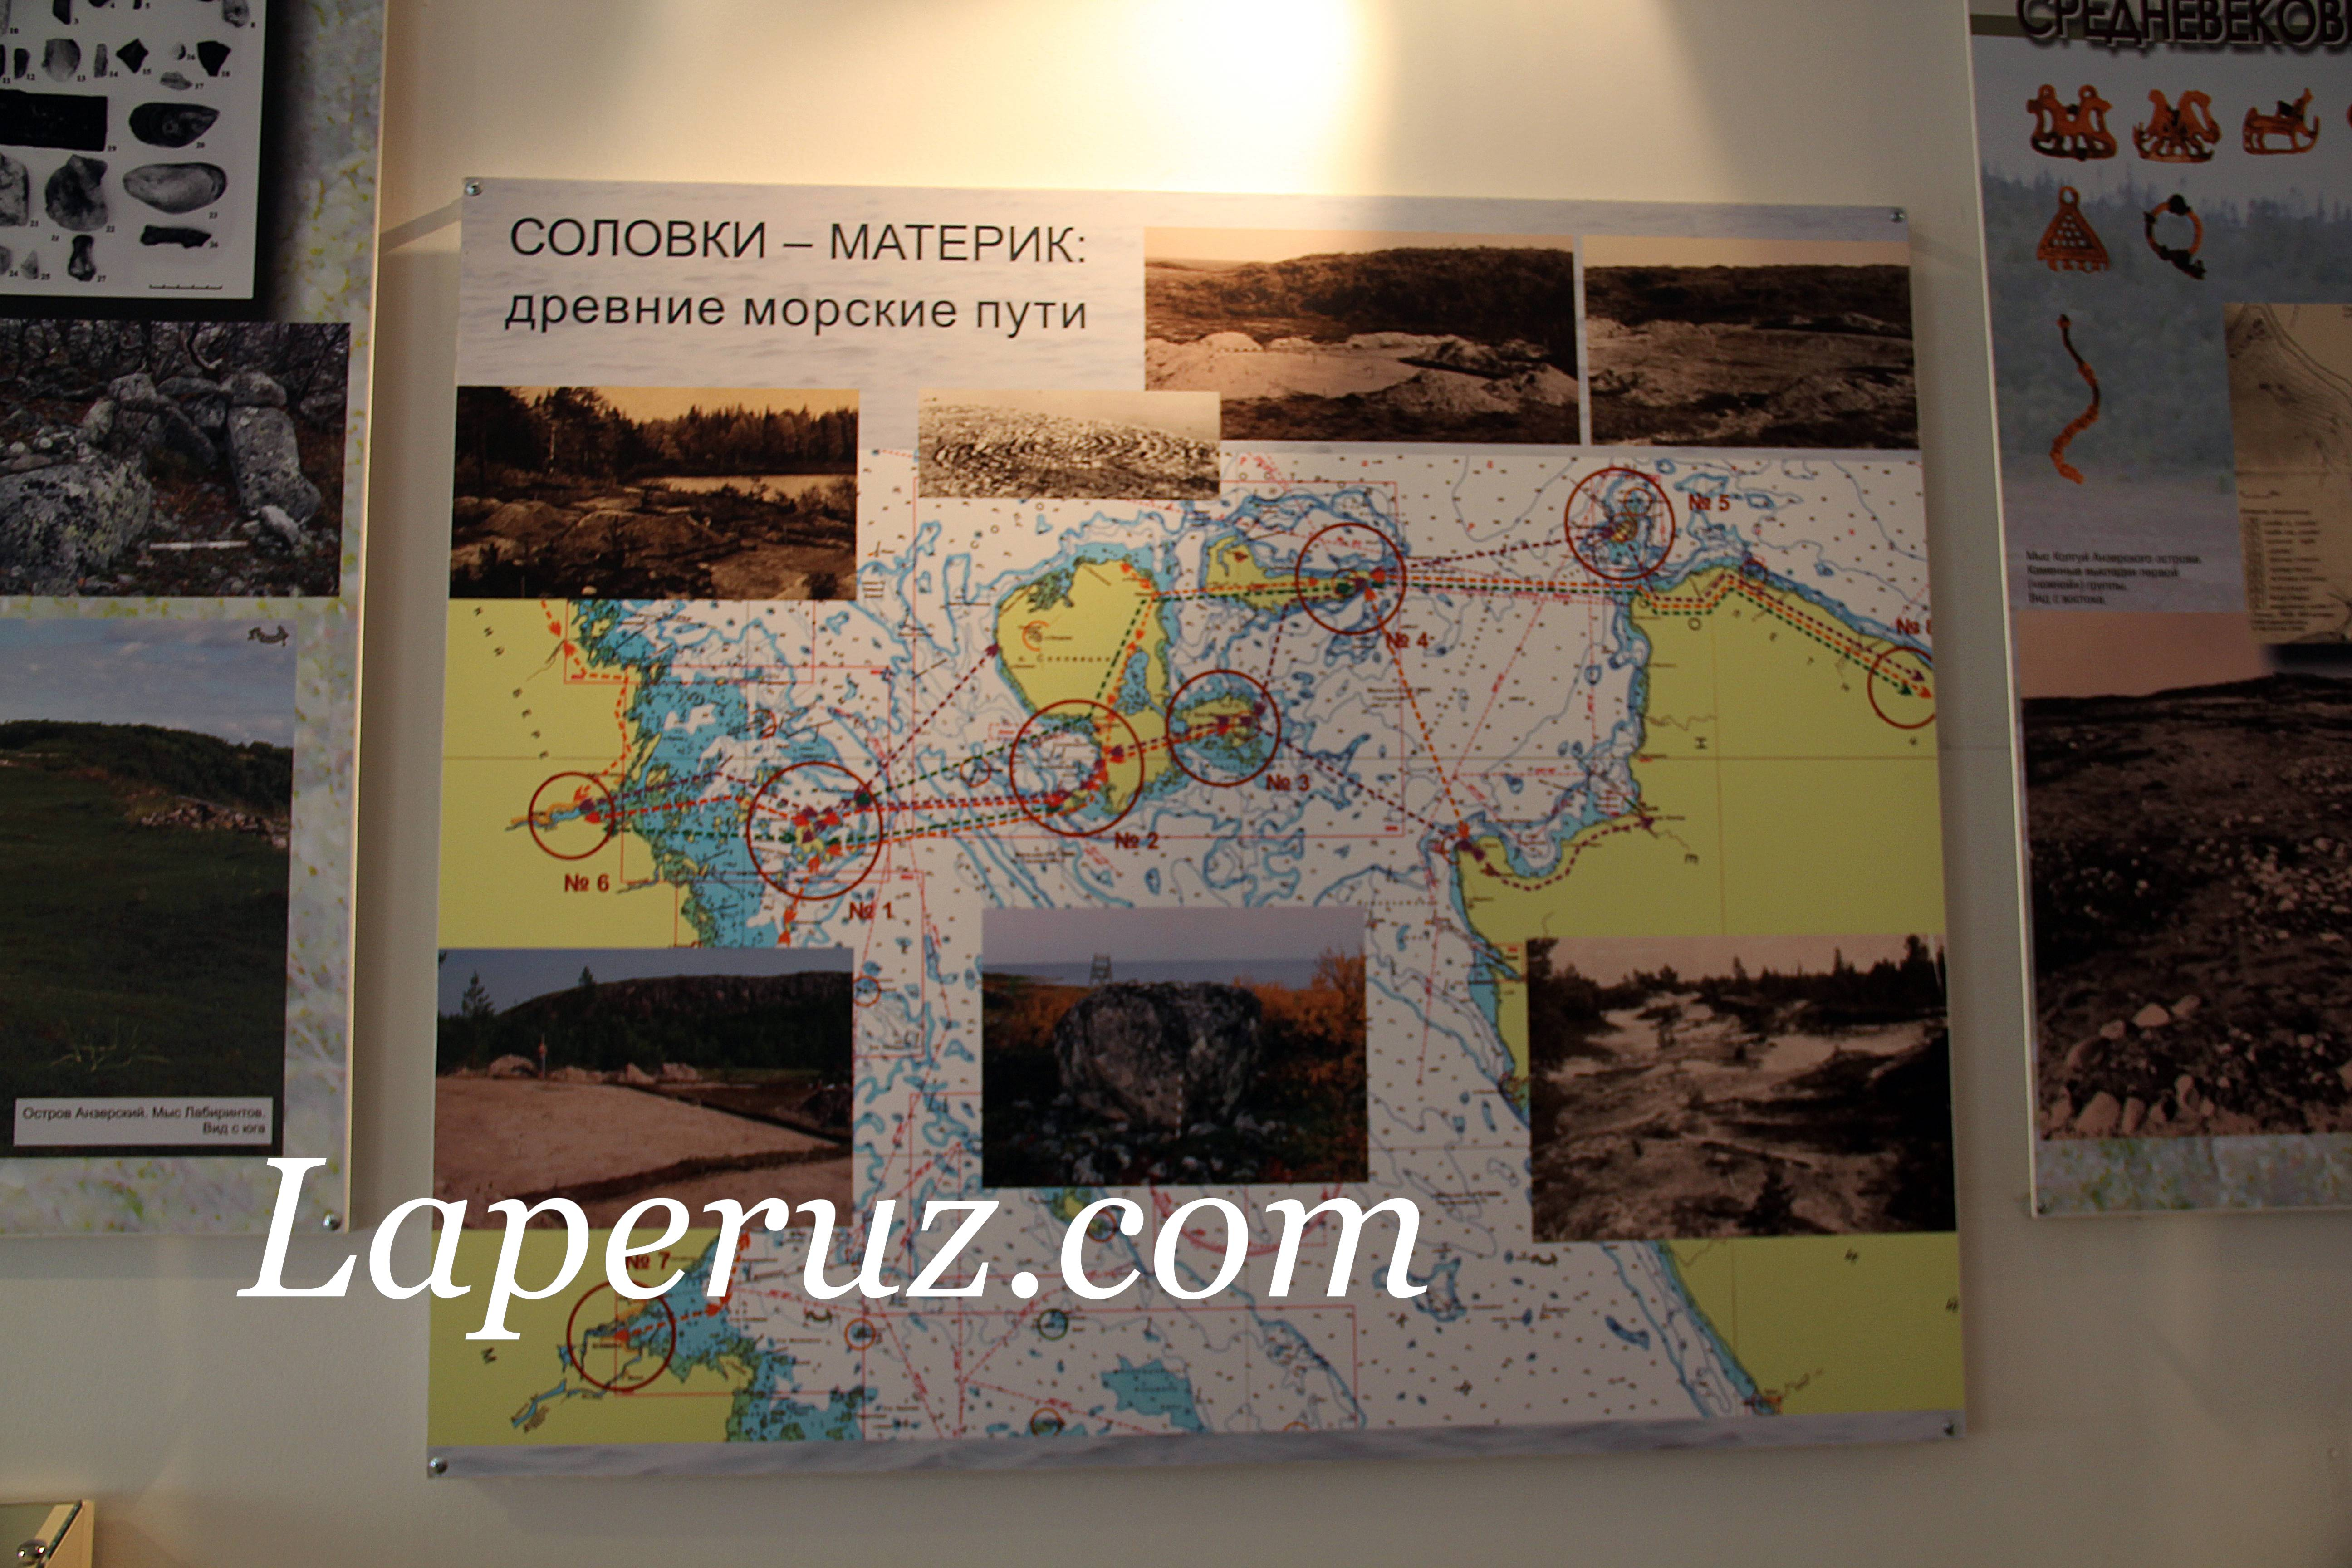 arheologicheskii_muzei_solovki_2